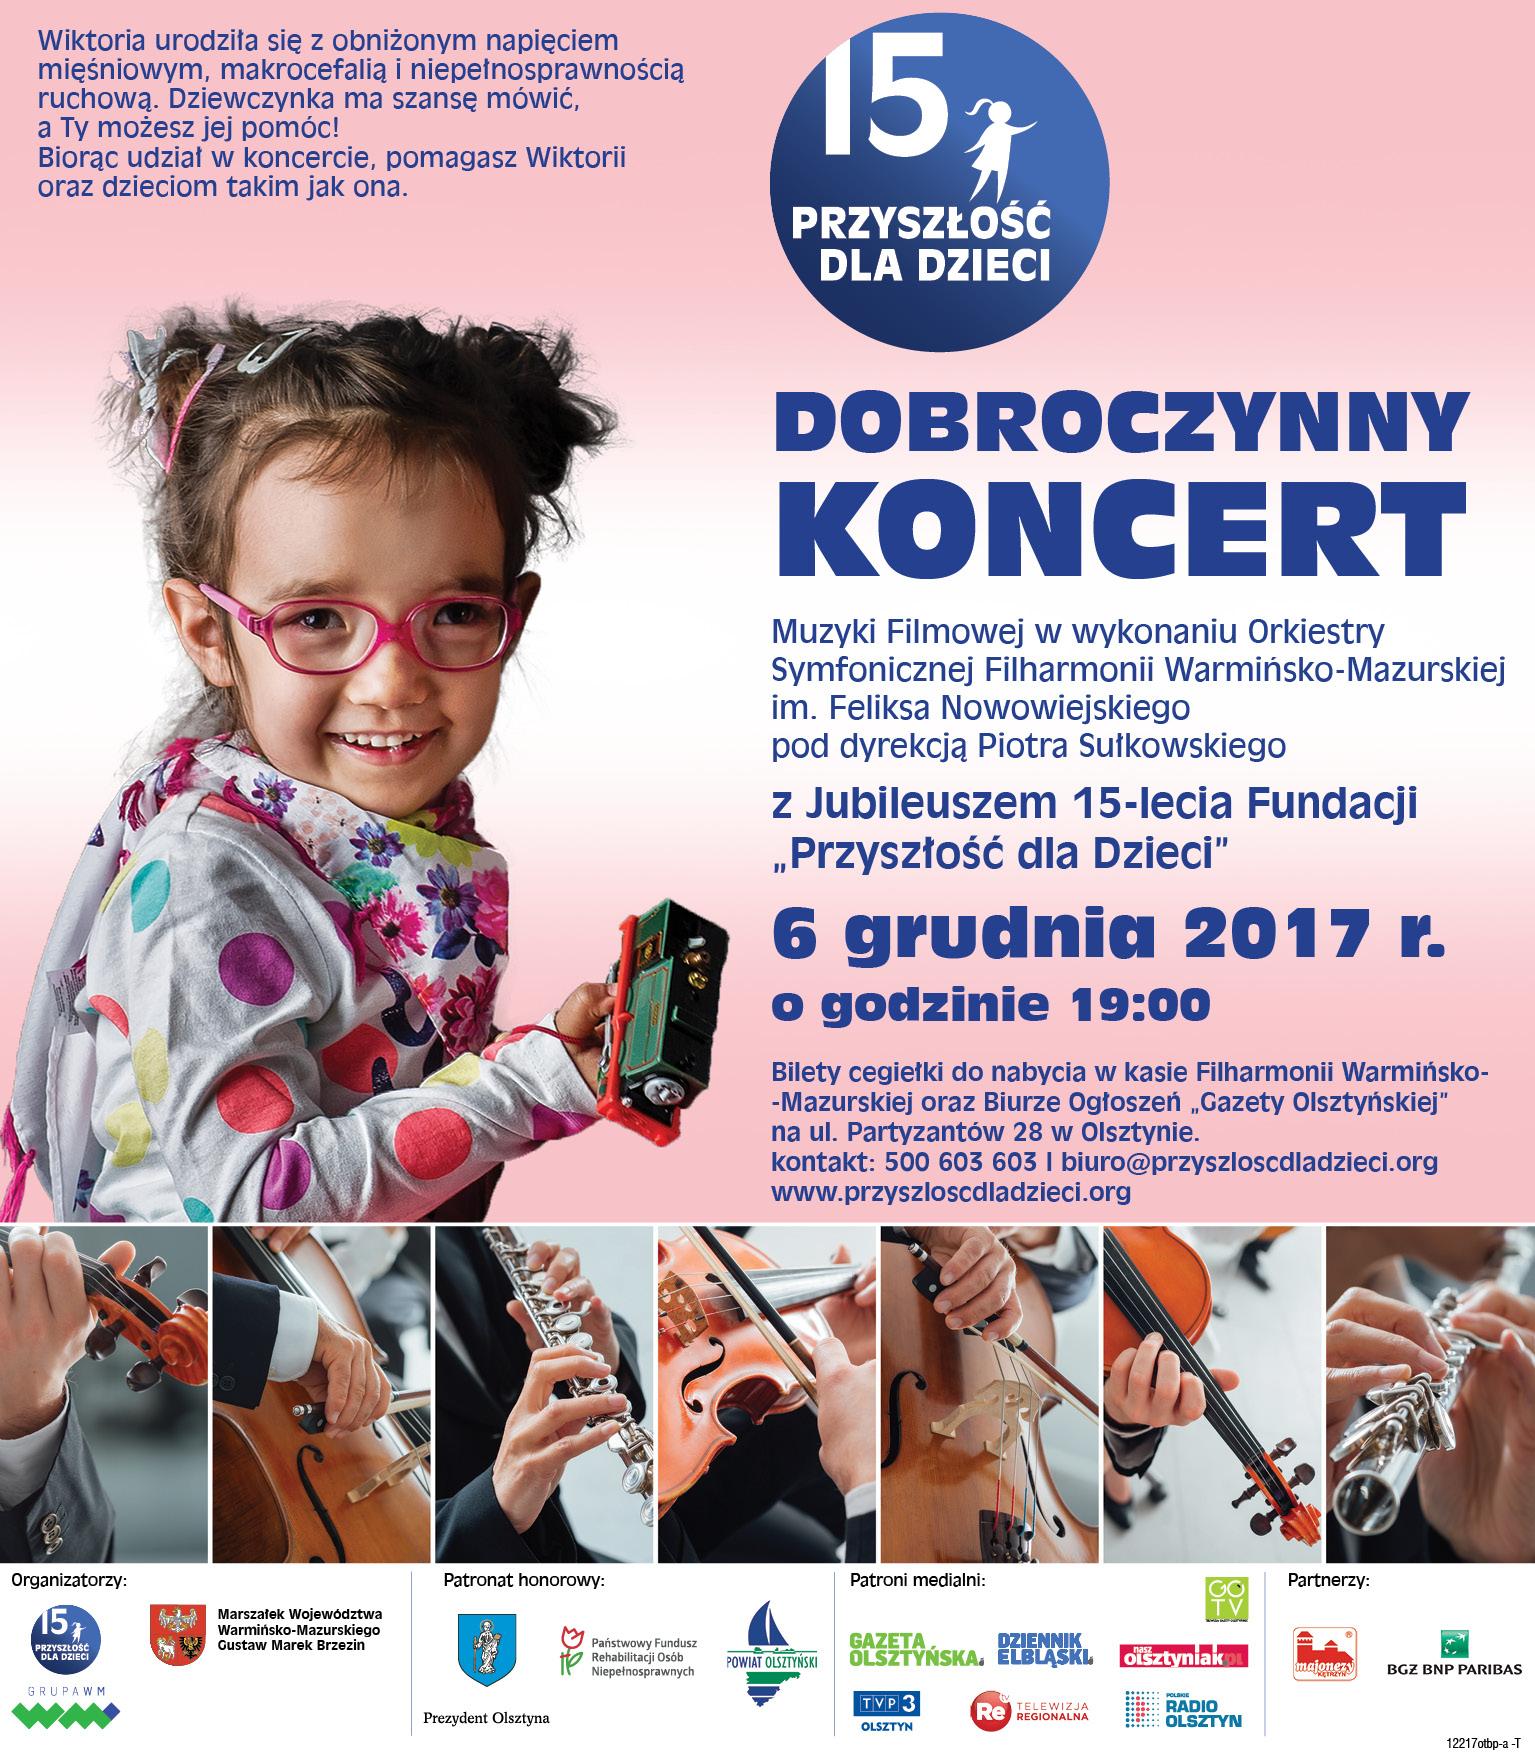 http://m.wm.pl/2017/12/orig/plakat-koncert-433391.jpg